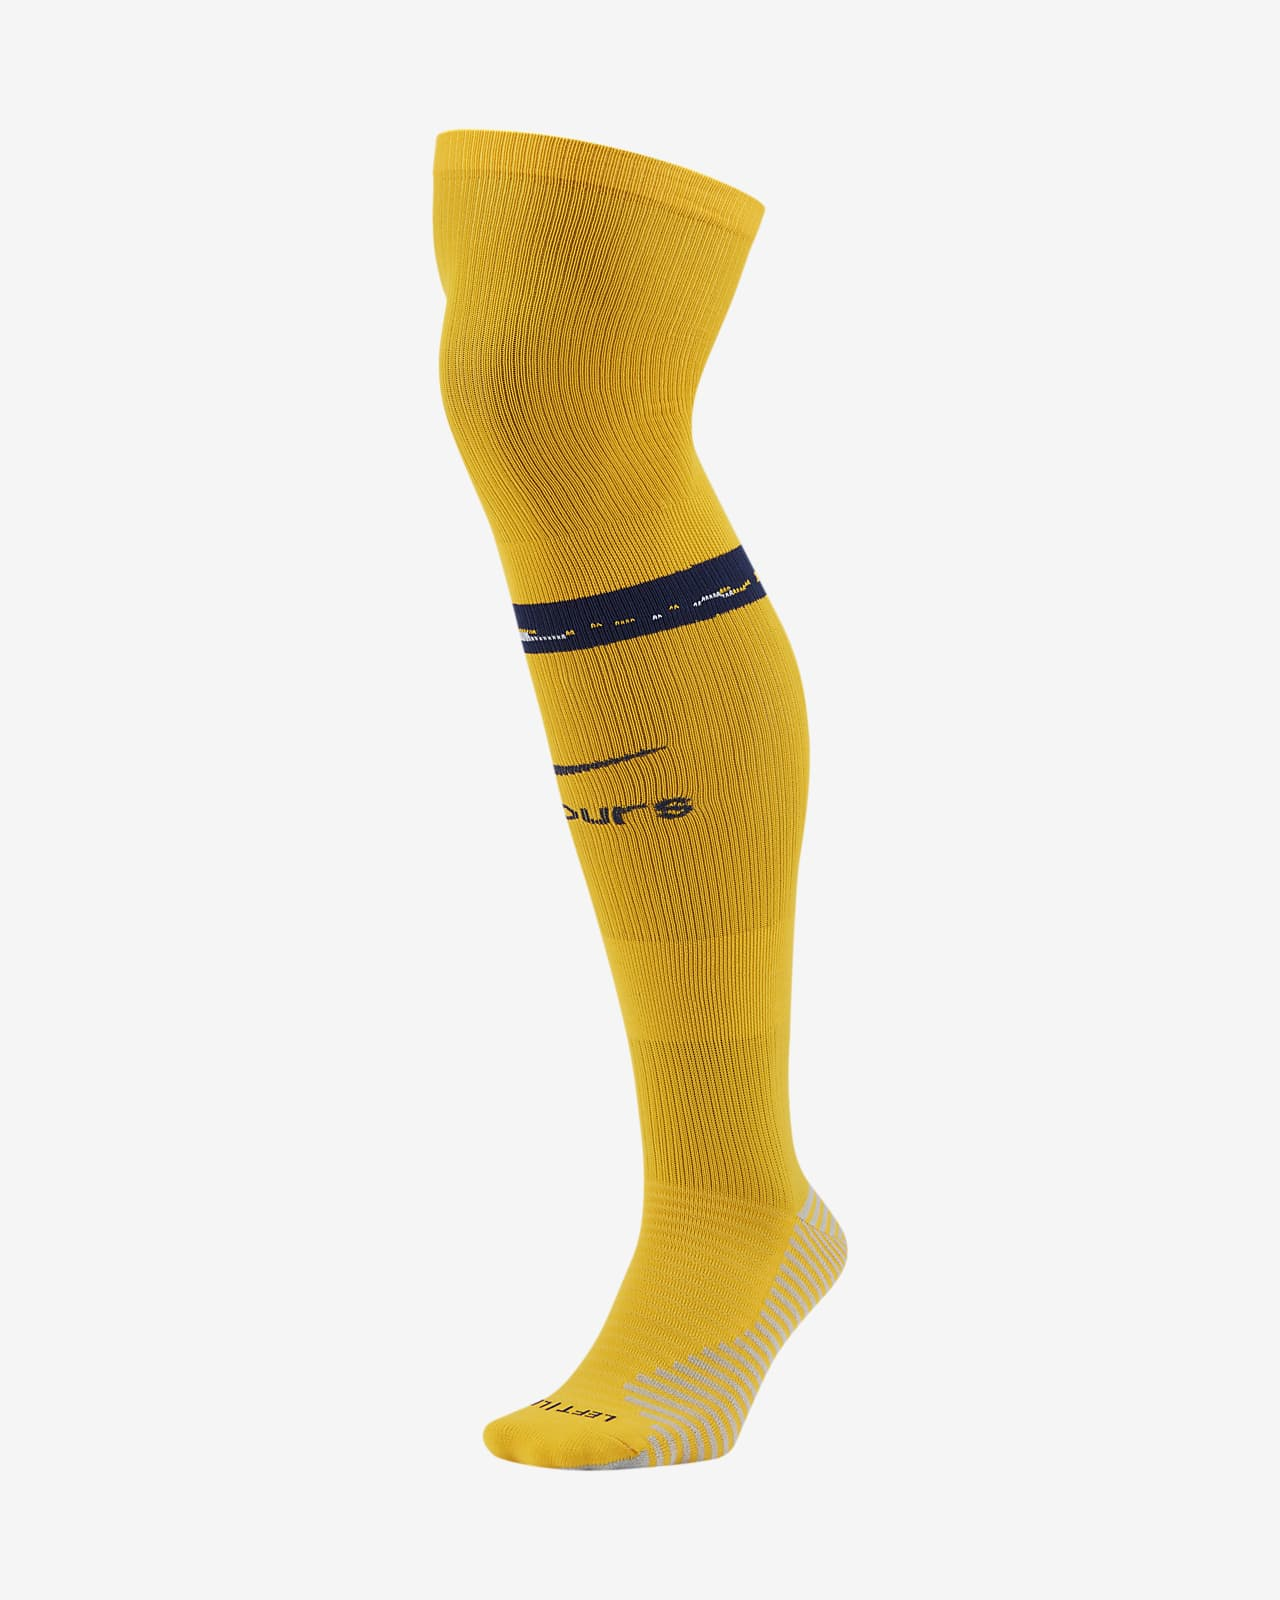 Tottenham Hotspur 2020/21 Stadium Third Football Over-the-Calf Socks